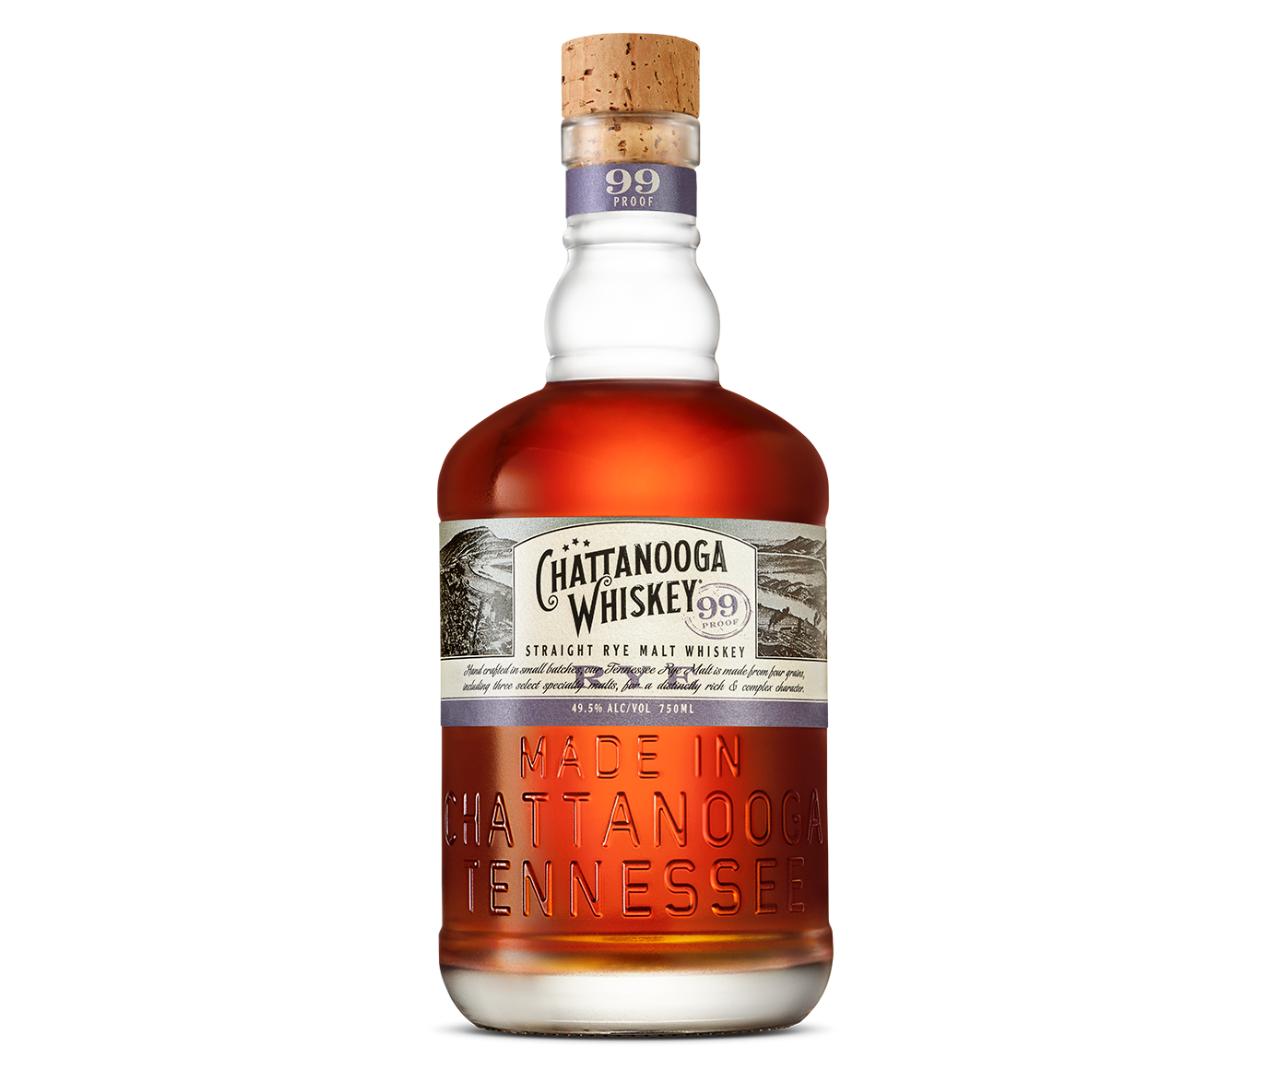 Chattanooga Whiskey 99 Rye